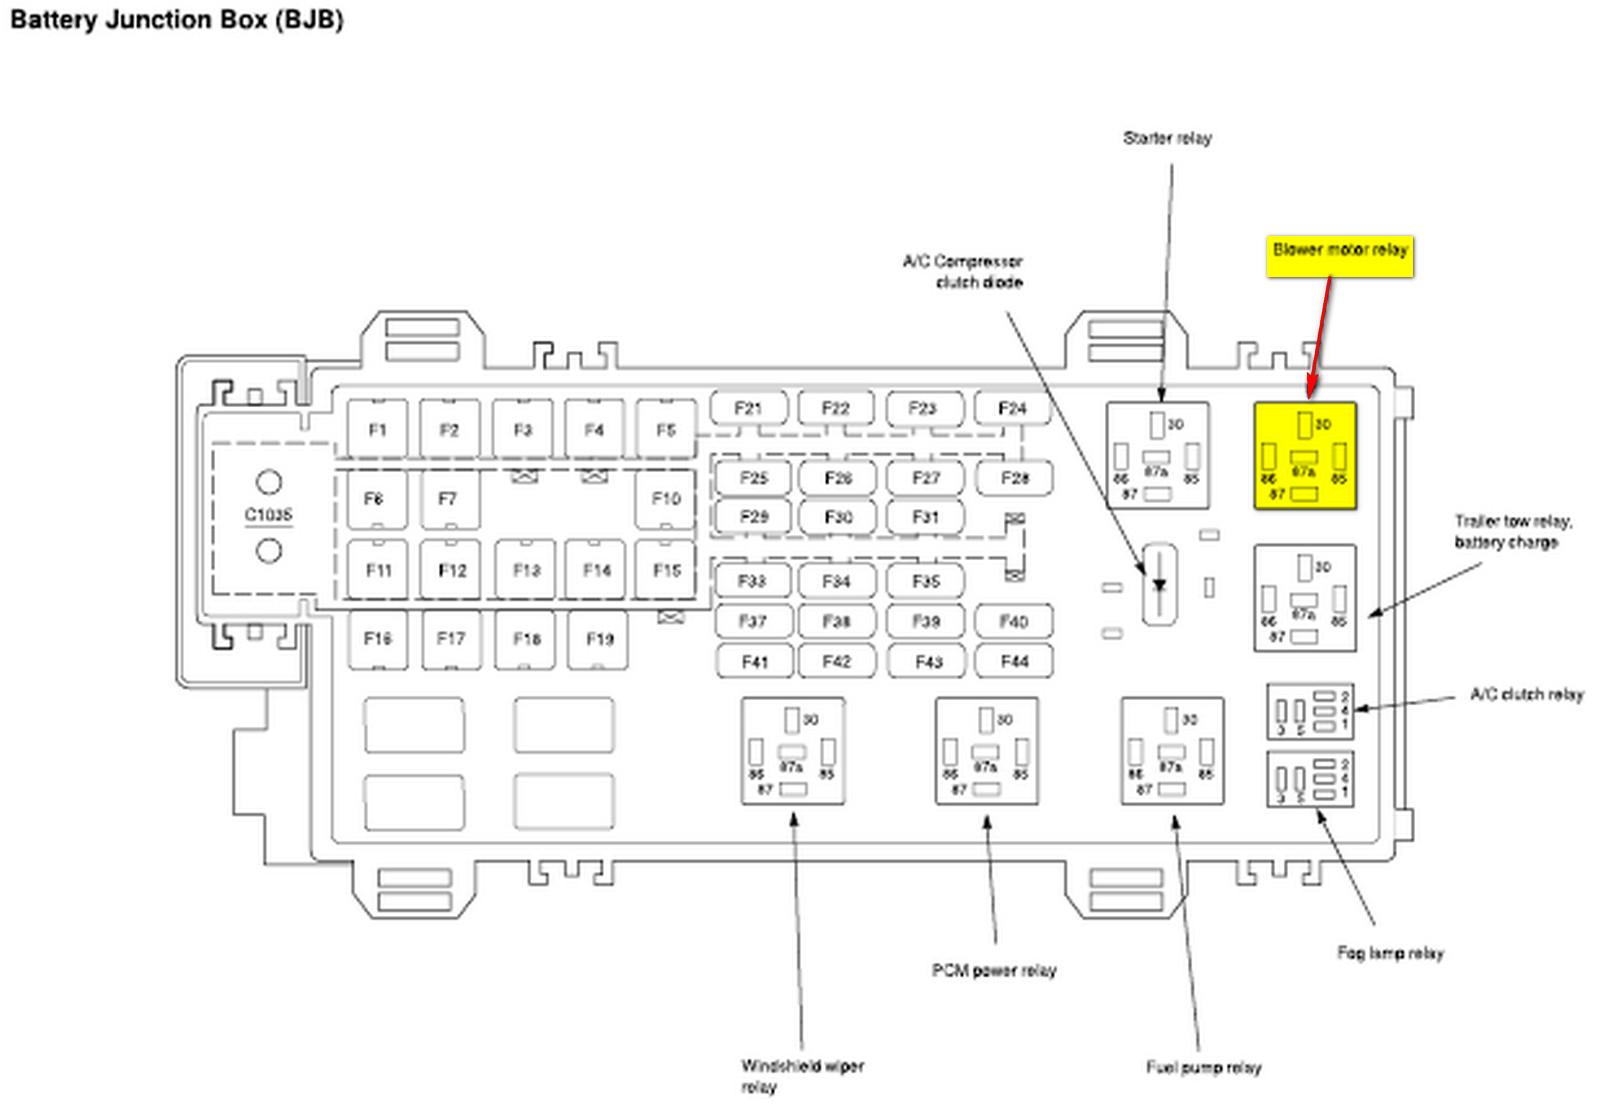 2006 explorer fuse box diagram 2006 diy wiring diagrams 2006 ford f650 fuse box #24, 2006 Ford F650 Hood